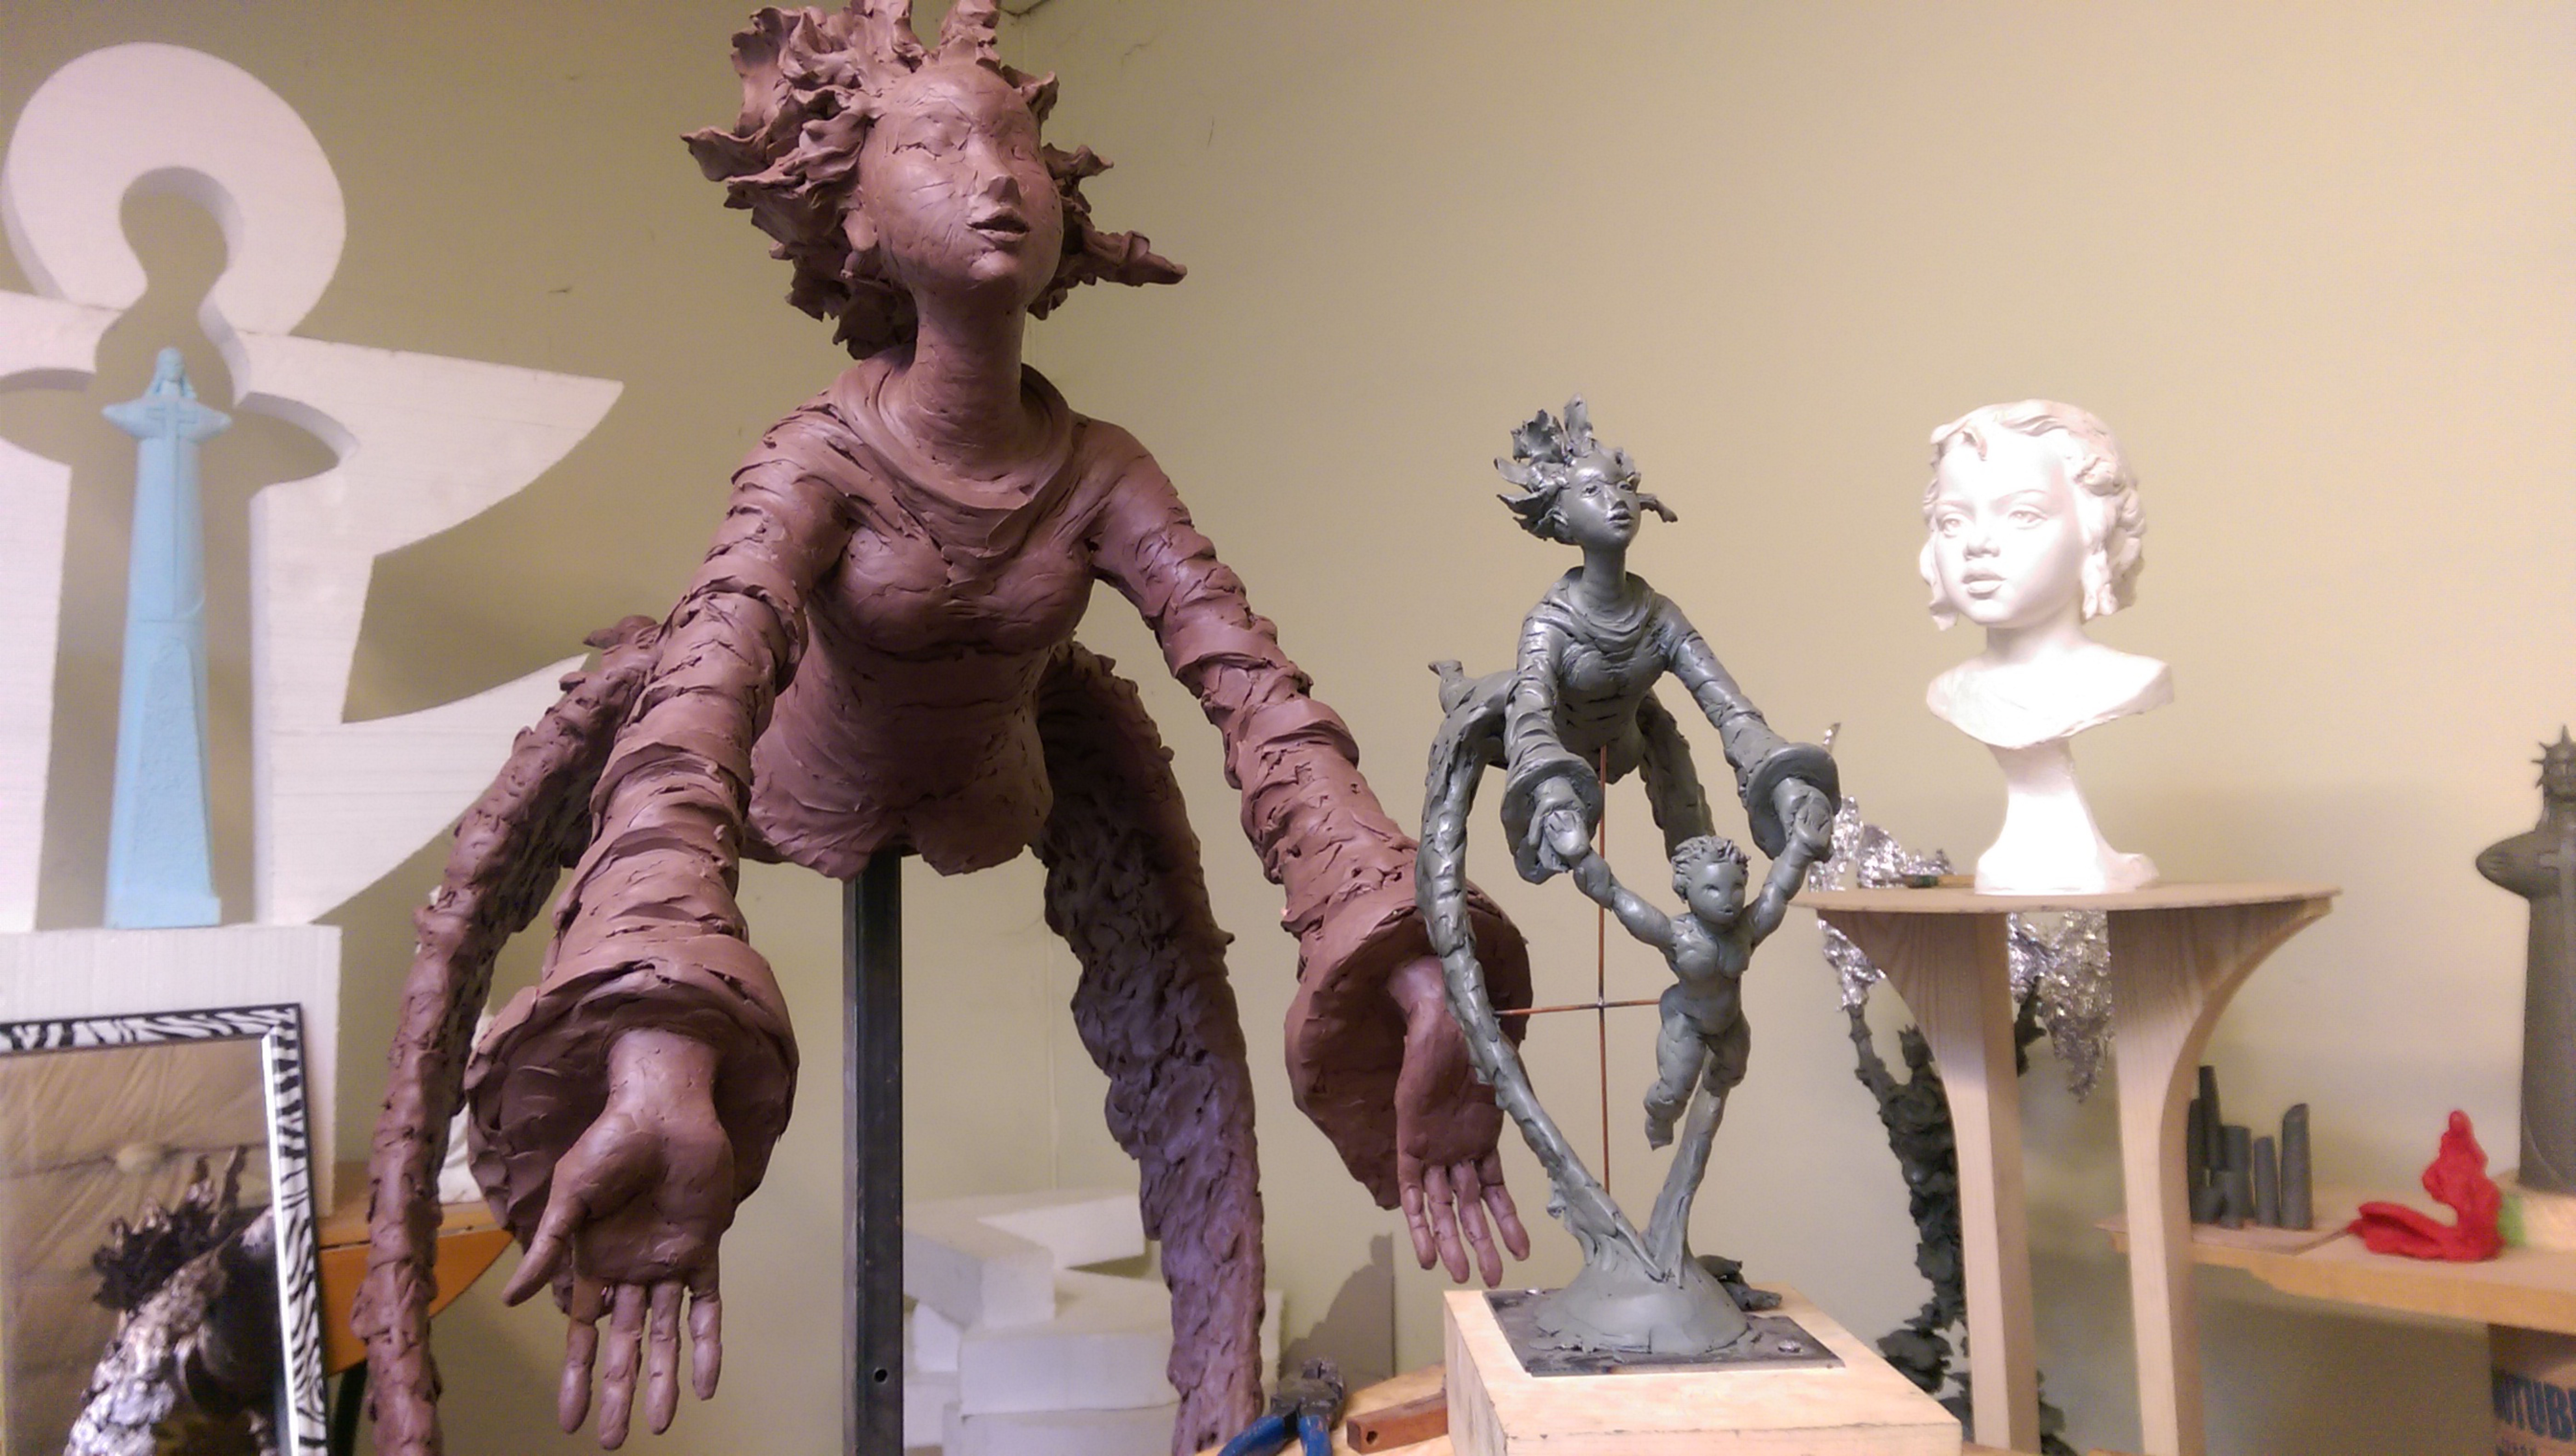 Clay-statue-enlargement-Seattle